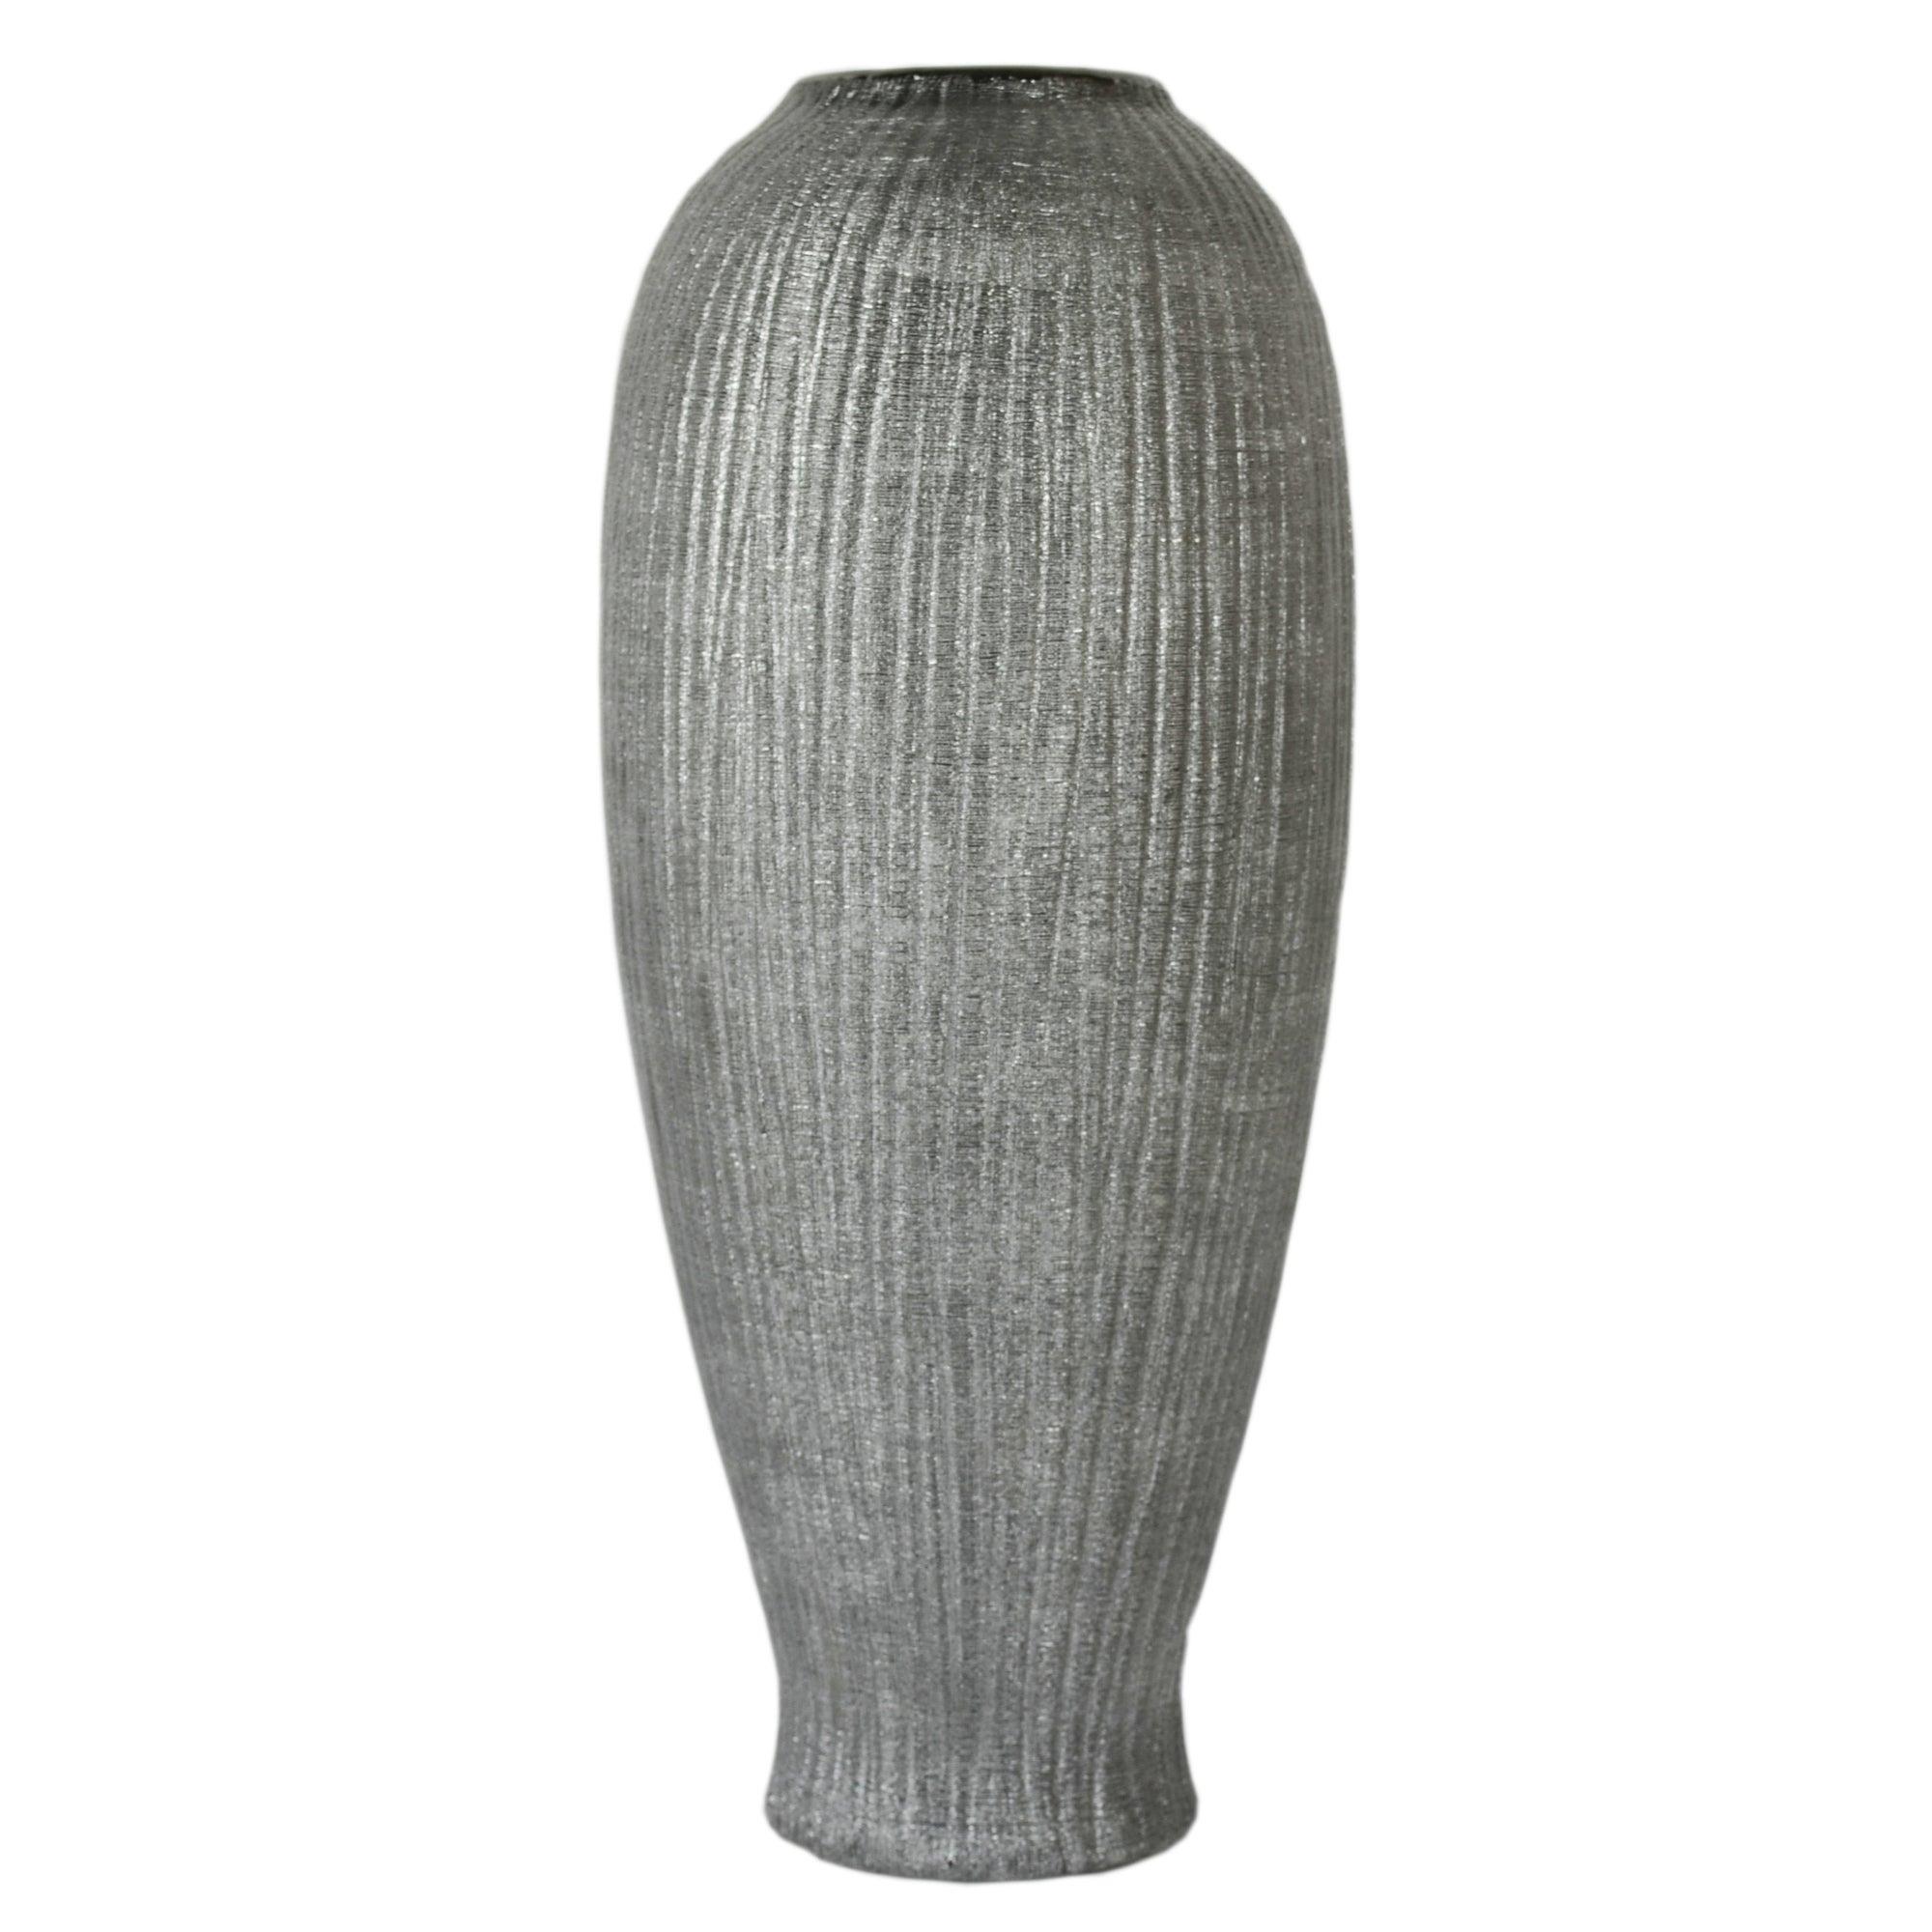 New Naturals Collection Ridged Vase